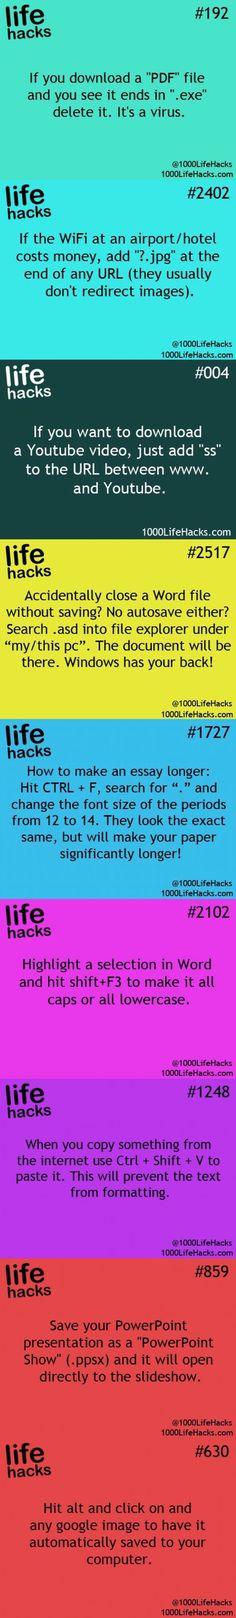 Life hacks 1000: